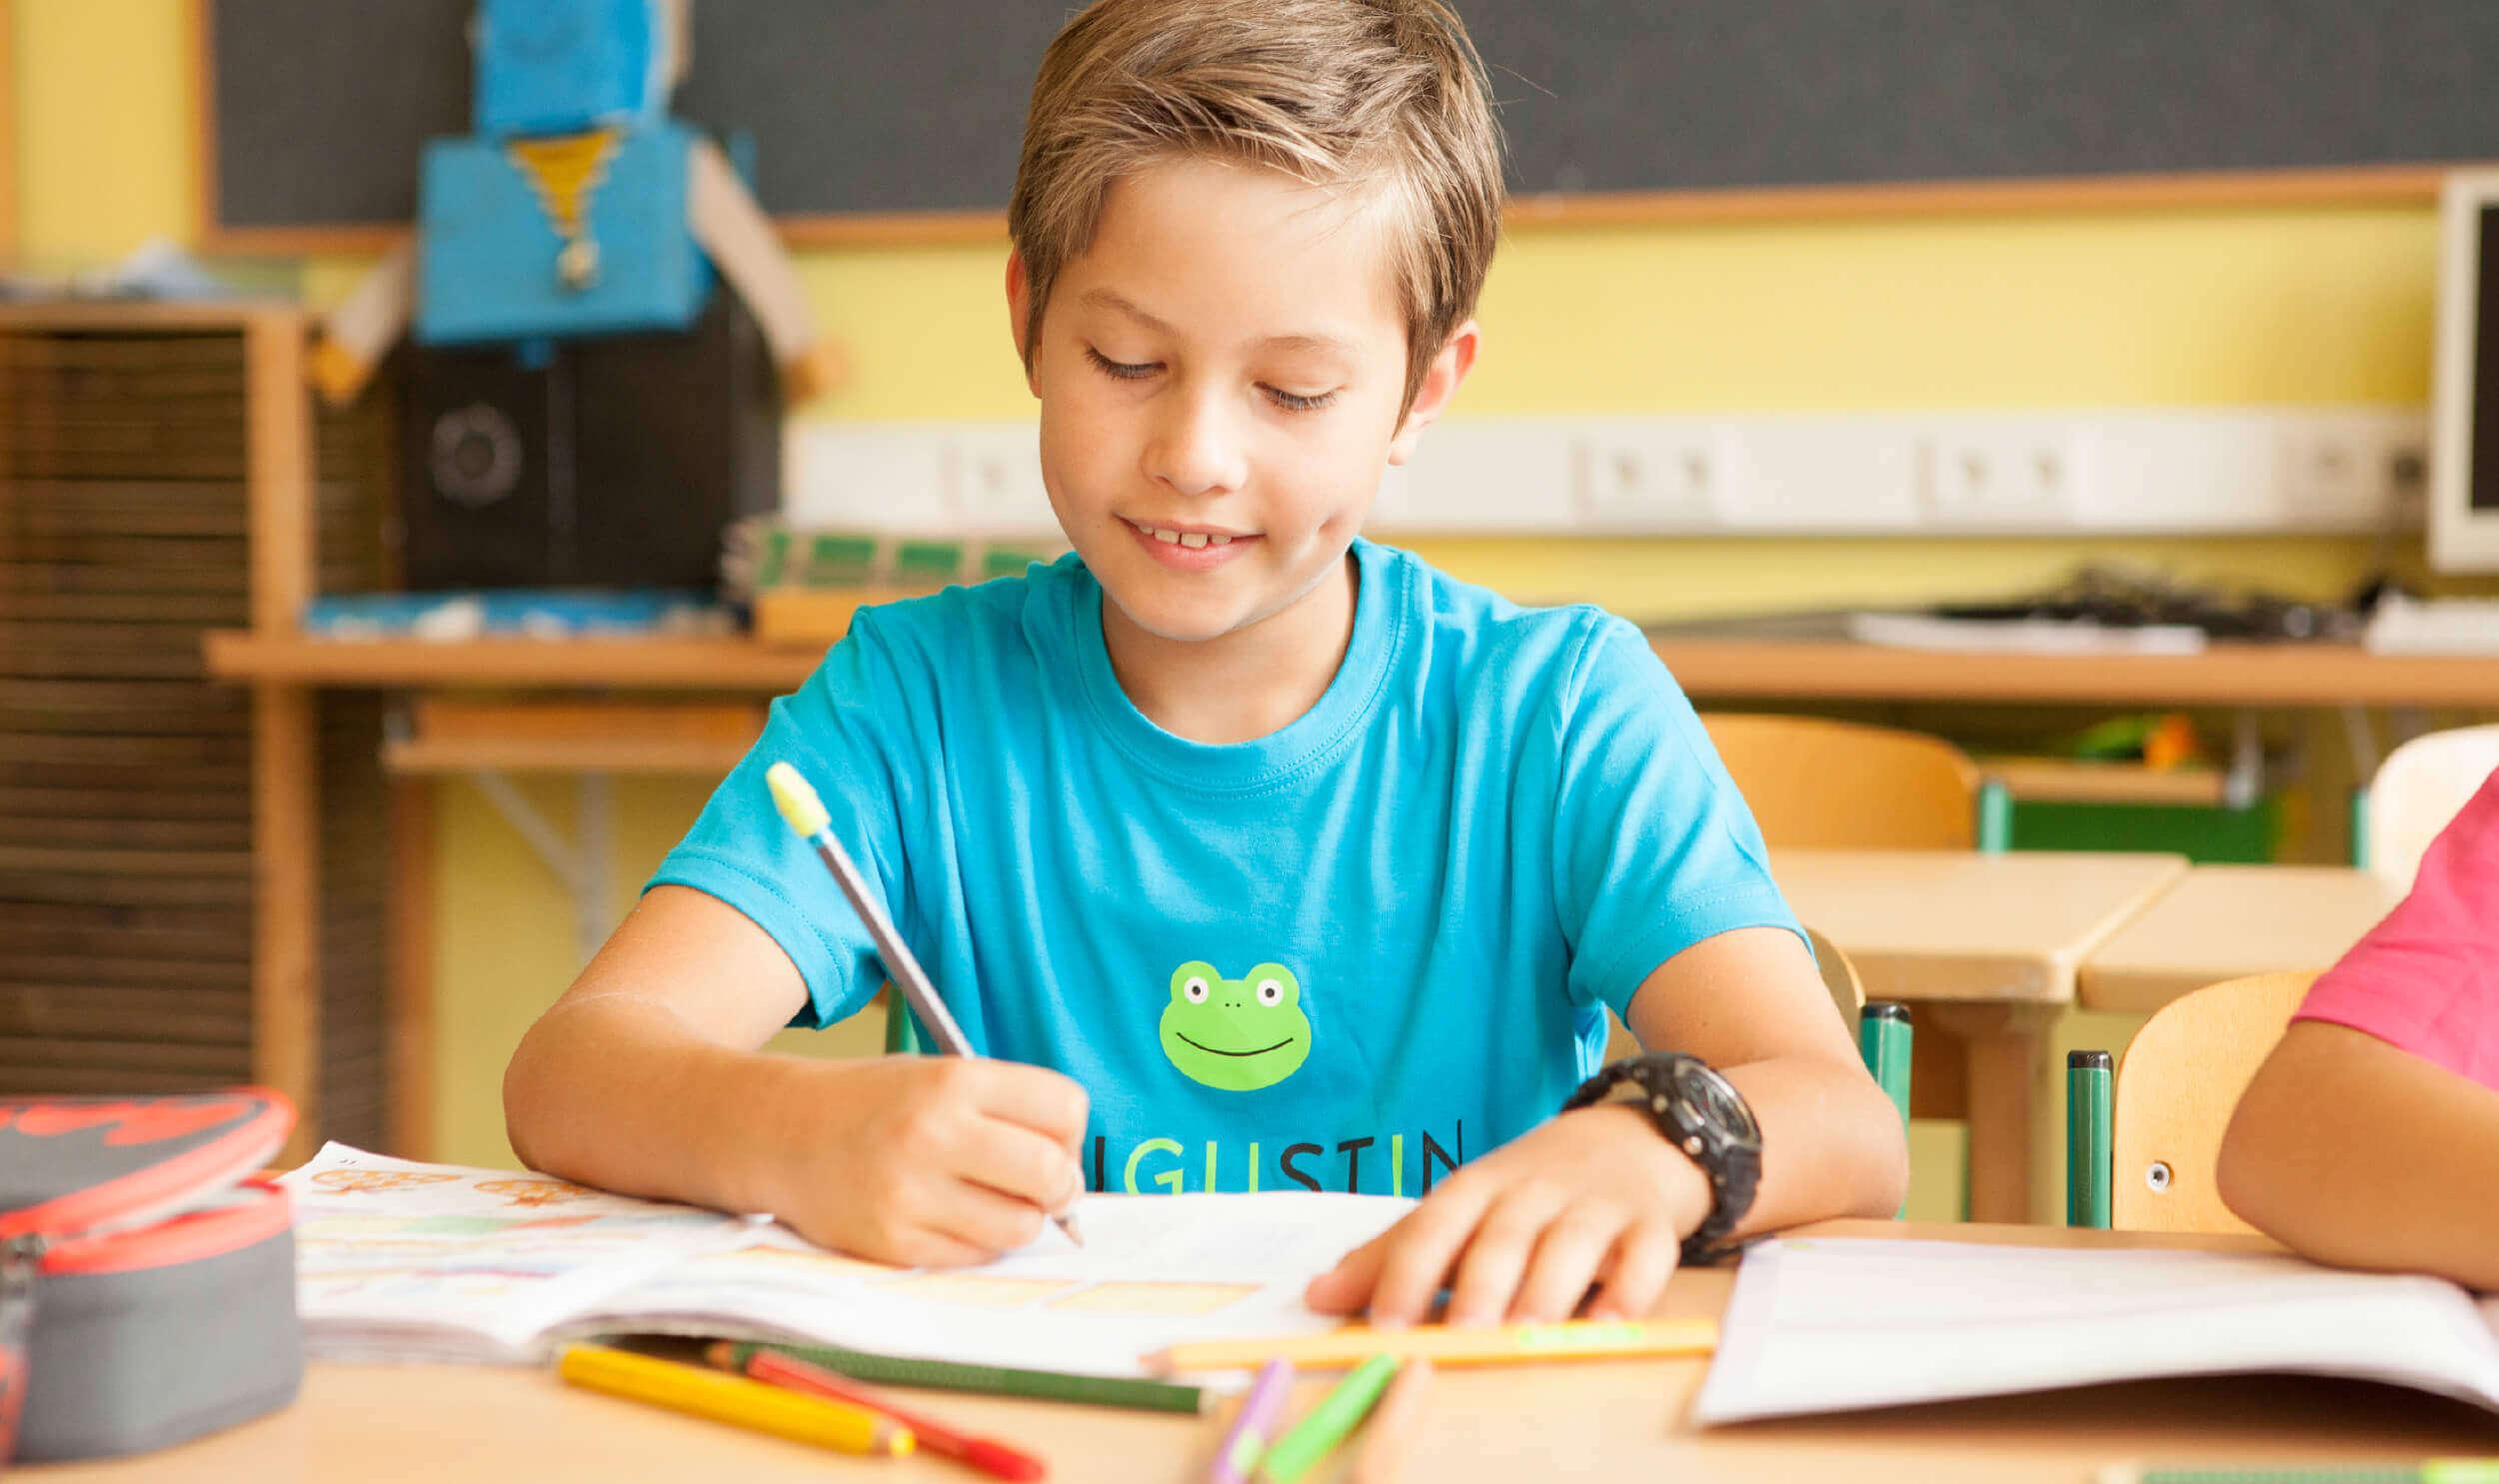 cyclos Augustin Wibbelt Schule Kinder